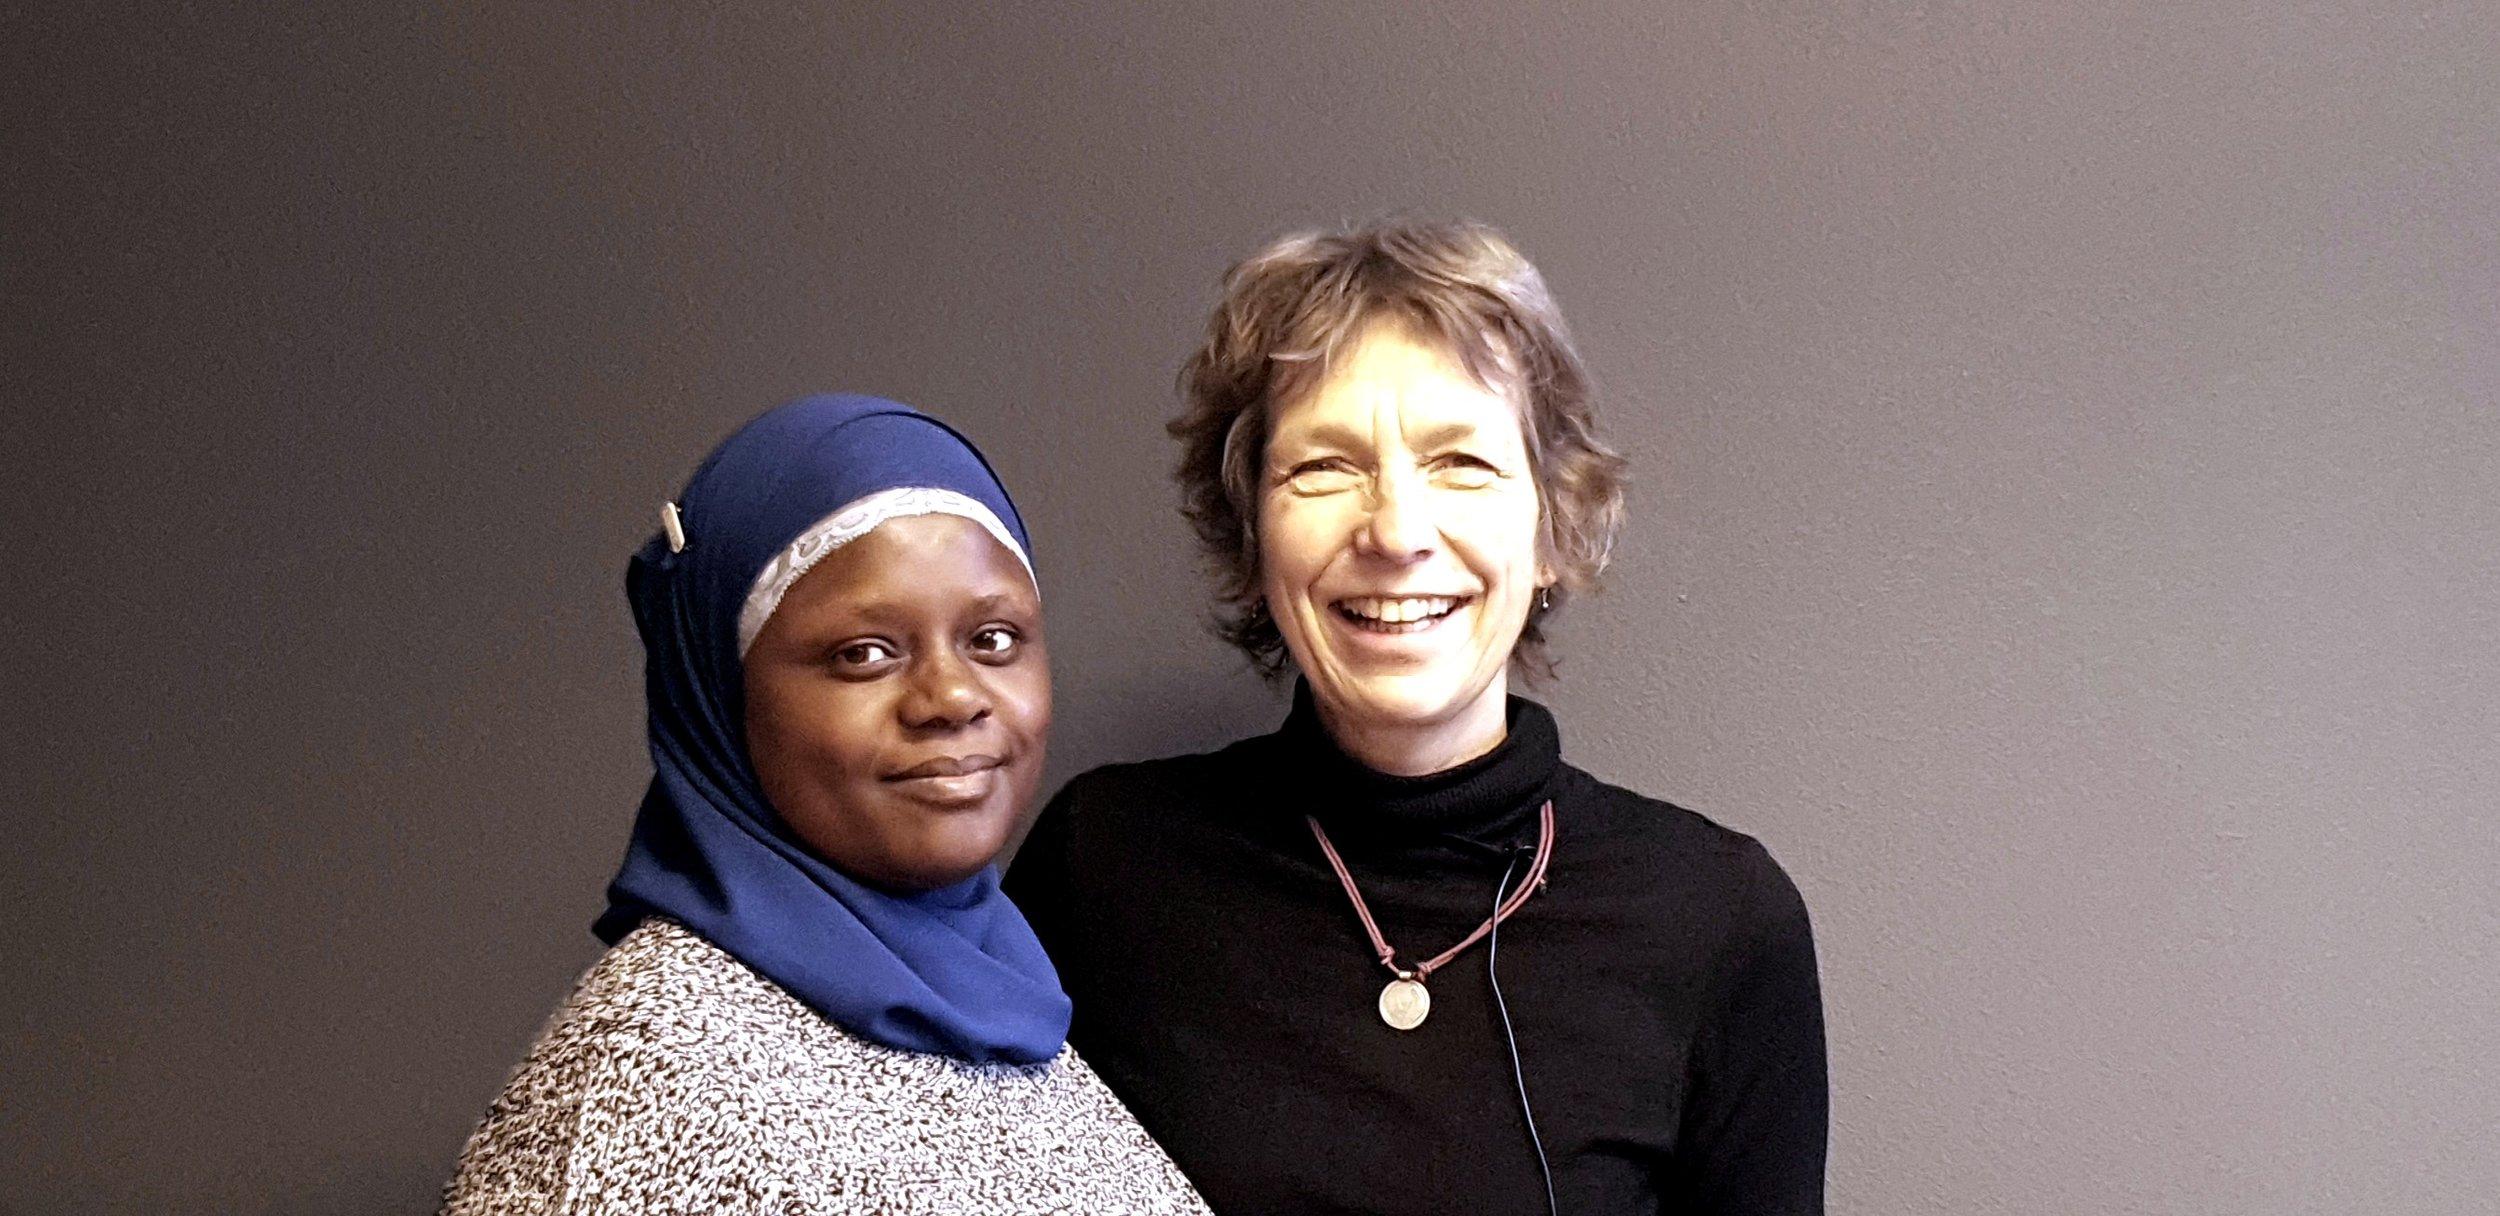 SAMMEN MOT TABUER: Abloom-leder Faridah S. Nabaggala og forsker Berit Berg ved NTNU. Foto: Bjørn Lecomte